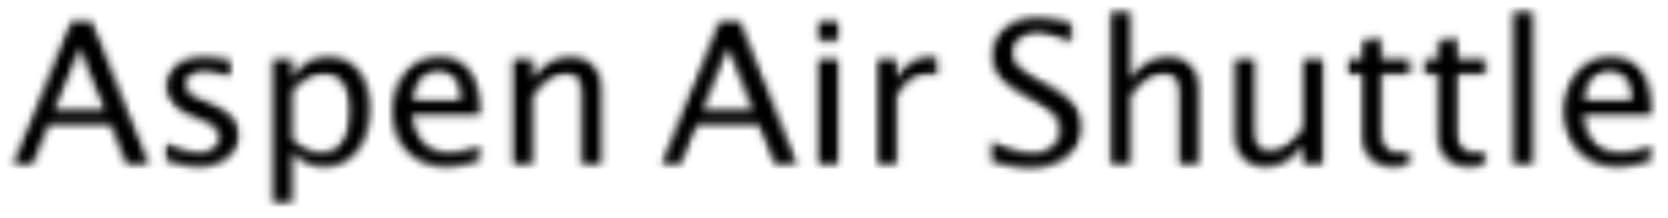 Aspen Air Shuttle Guide